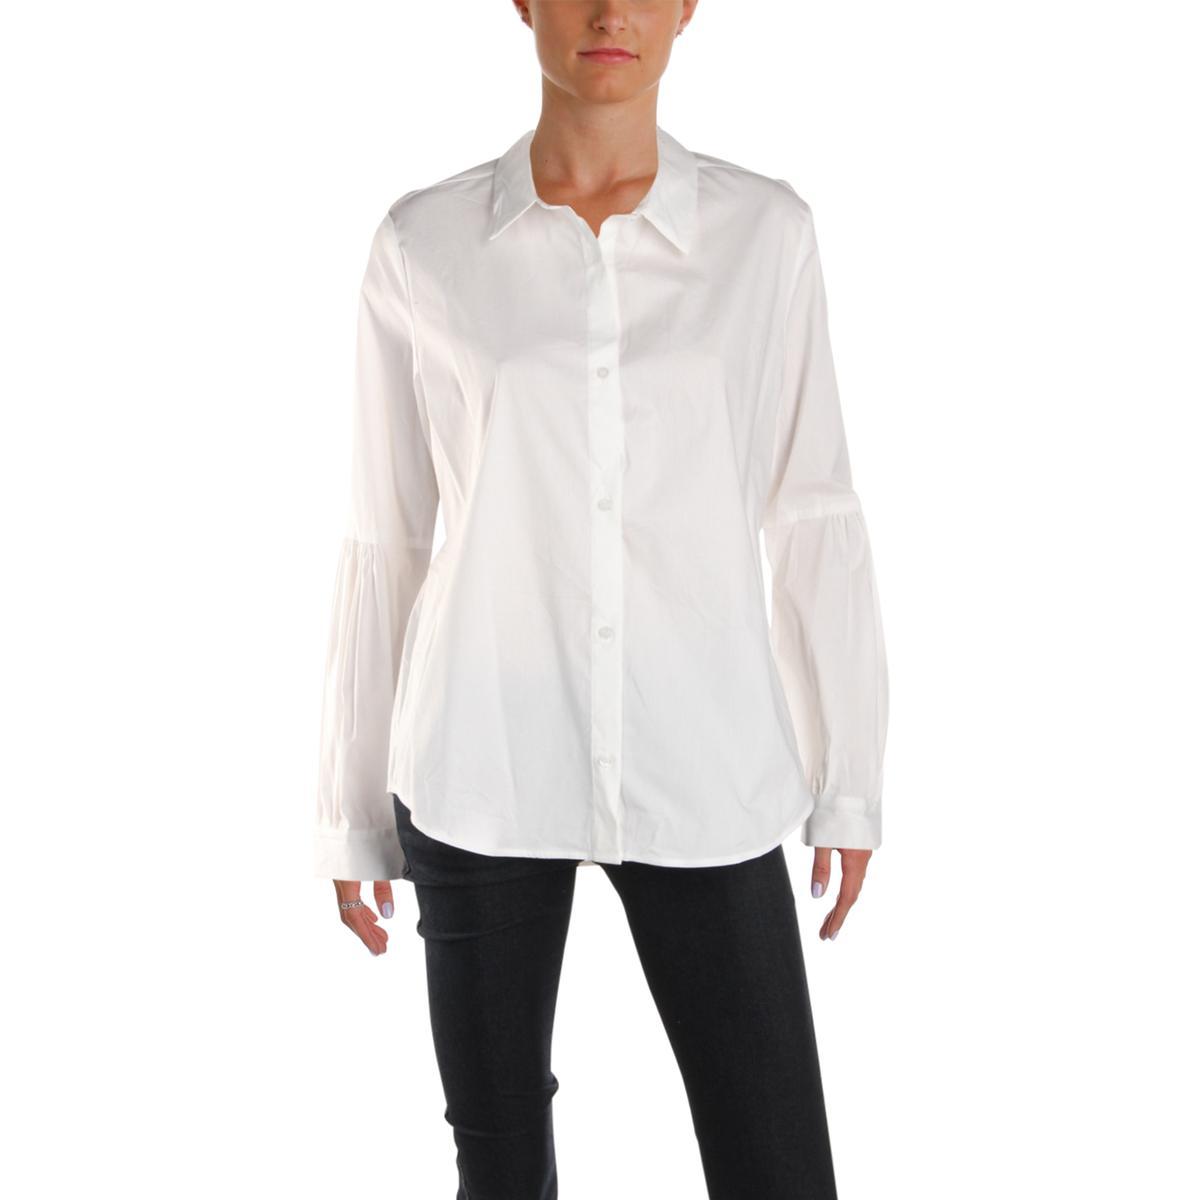 7f8394e2 Calvin Klein Womens White Sheer Collared Button-Down Top Blouse M ...